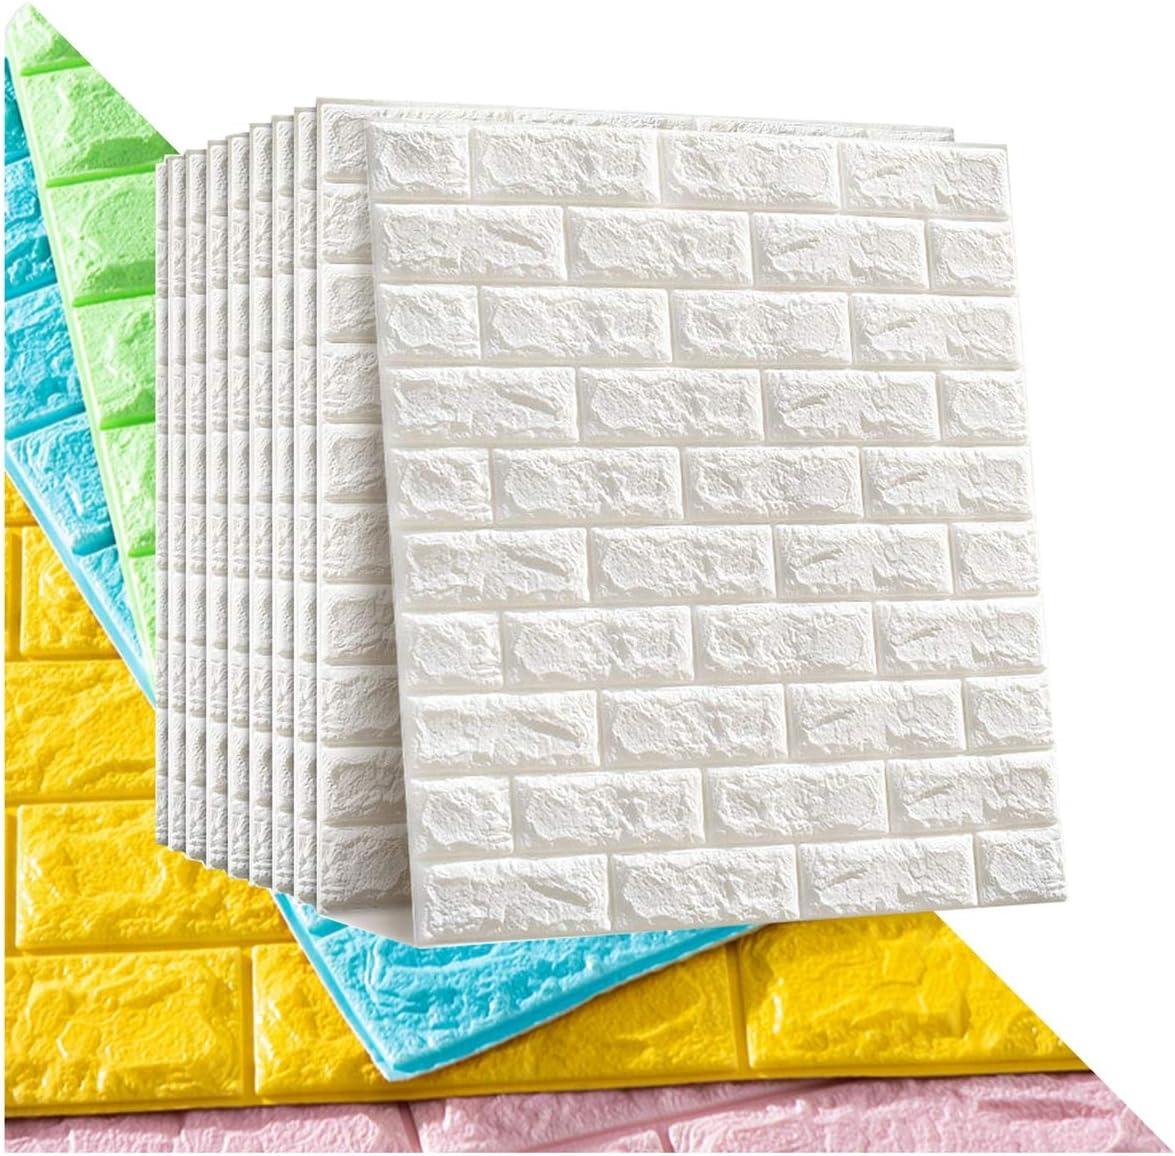 SS WANGZI 3D Tile low-pricing Wall Popular Brick Paper Panels,3D